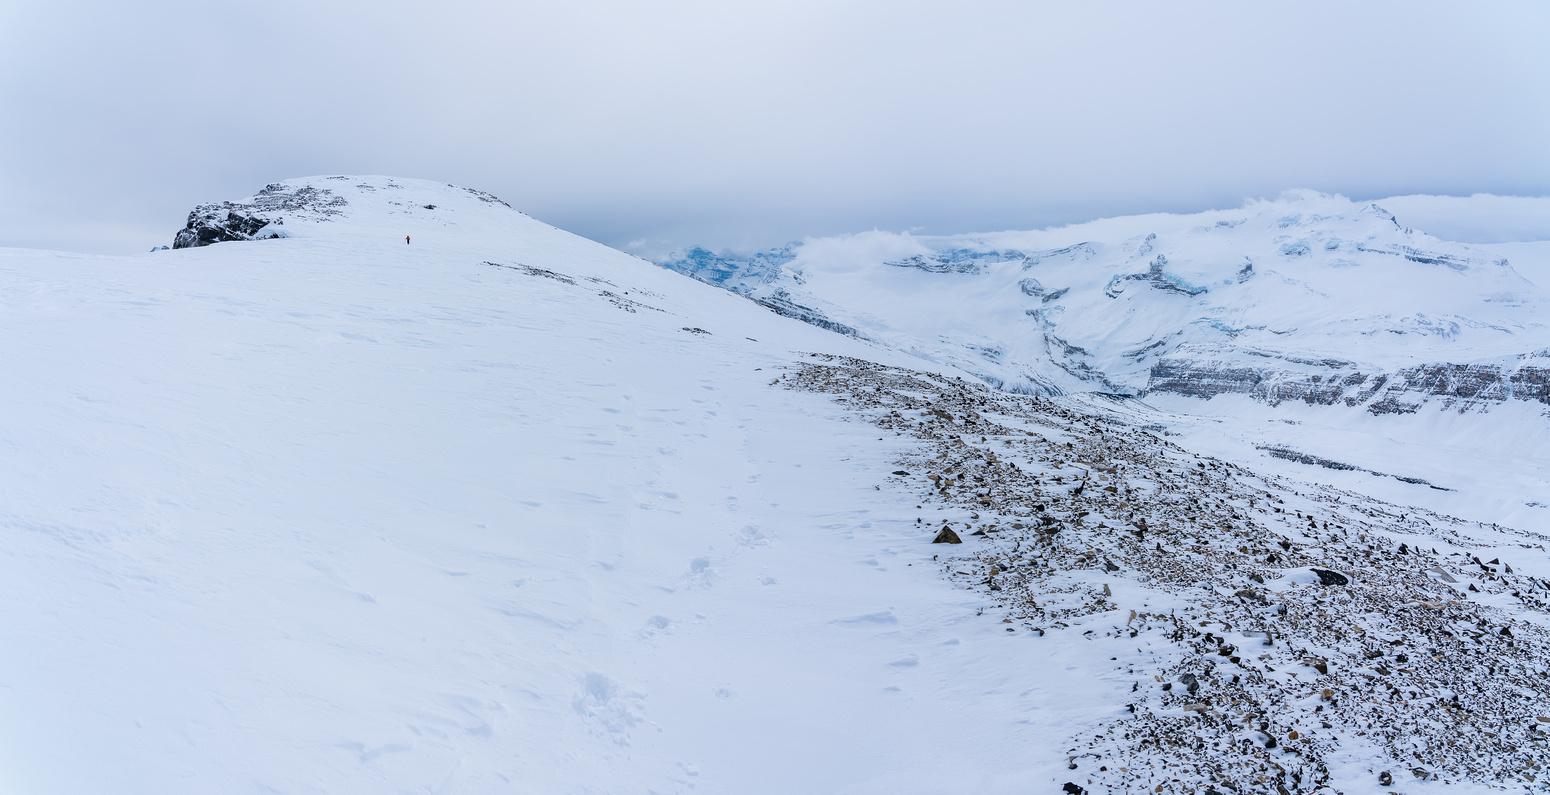 The summit ridge of Crowfoot Mountain.